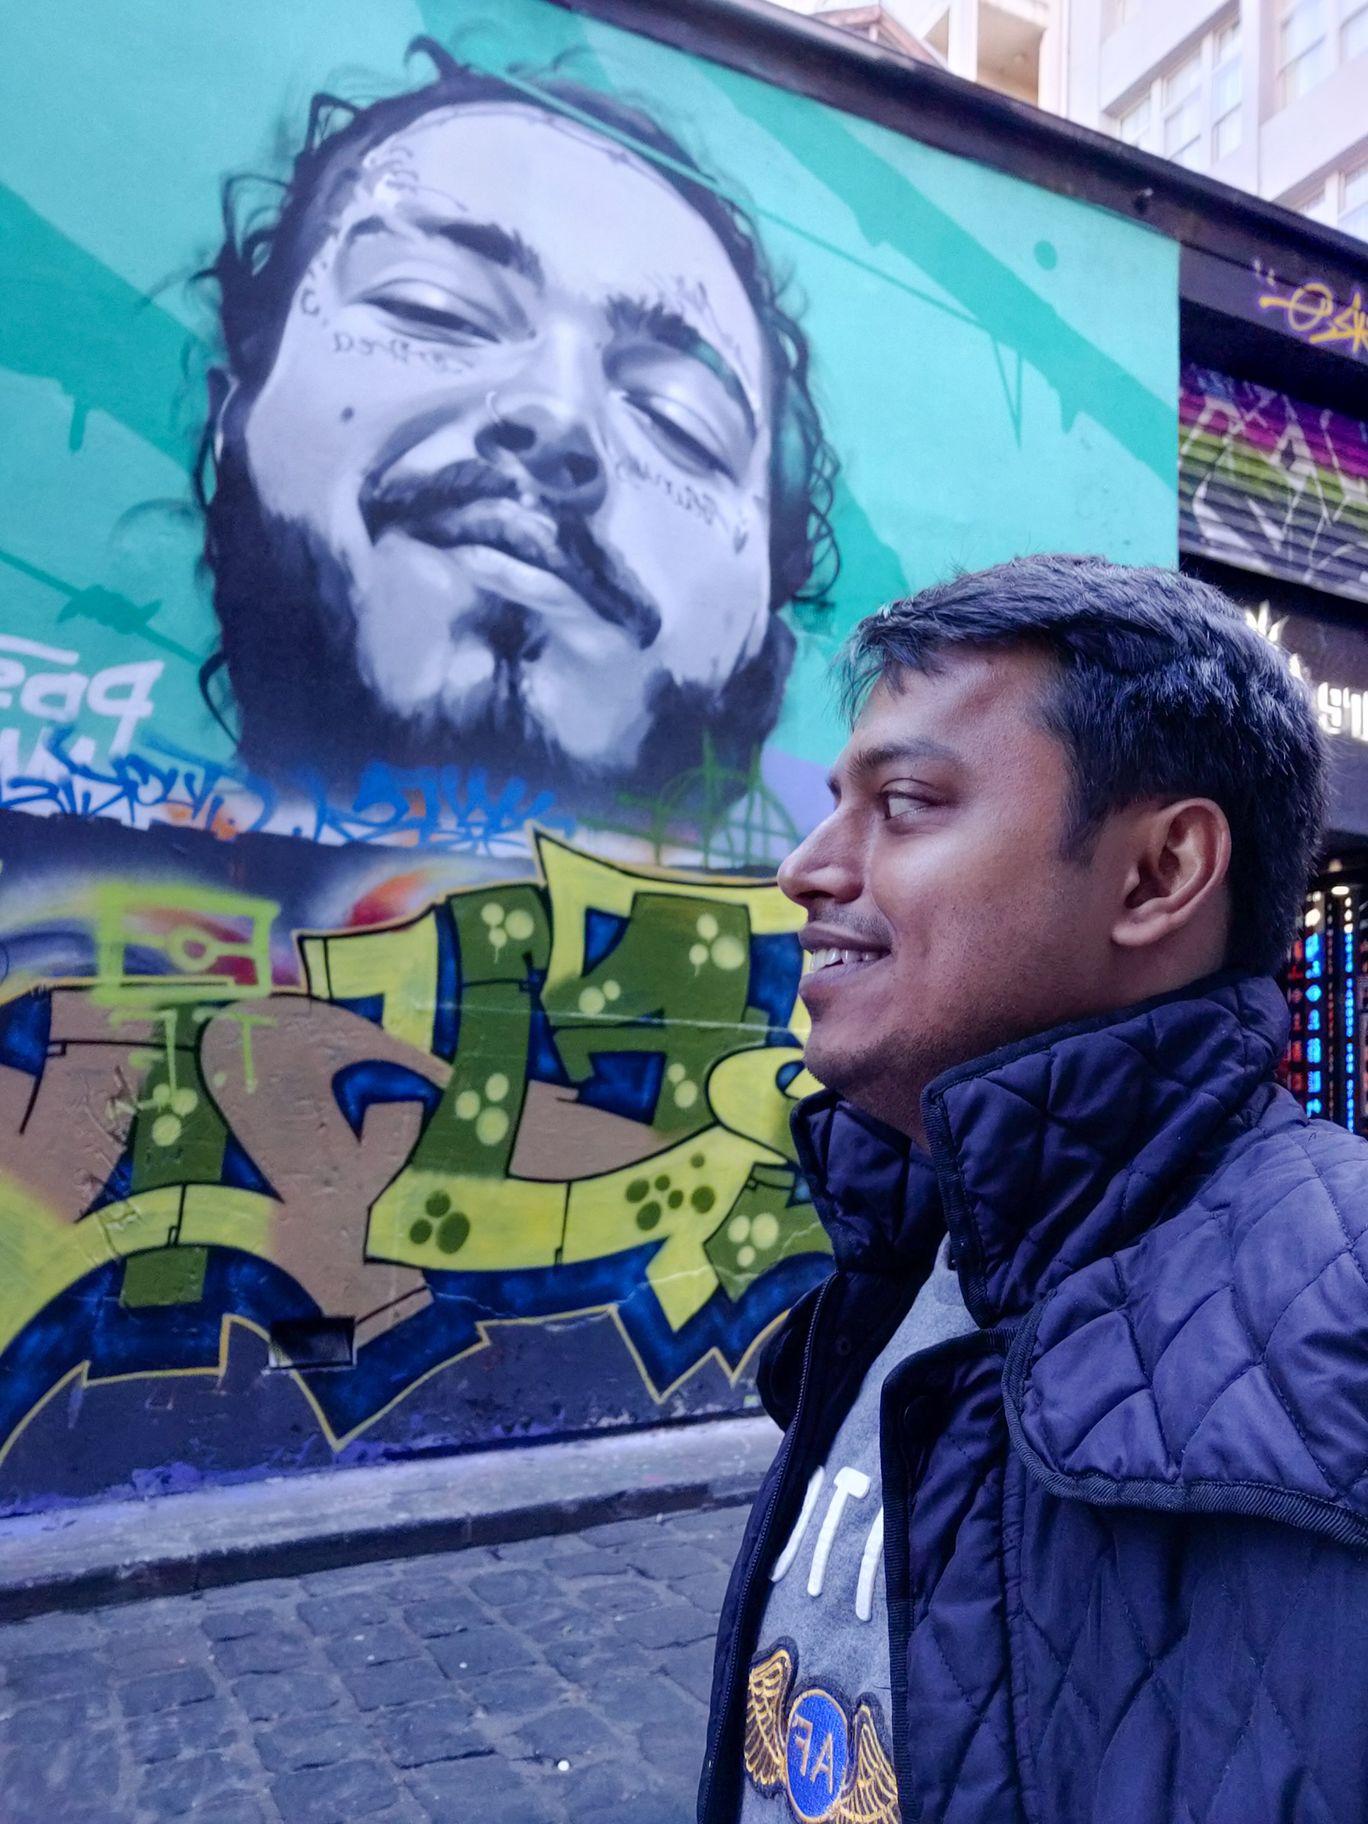 Photo of Hosier Lane By Rasesh Raja @moreovercoffee